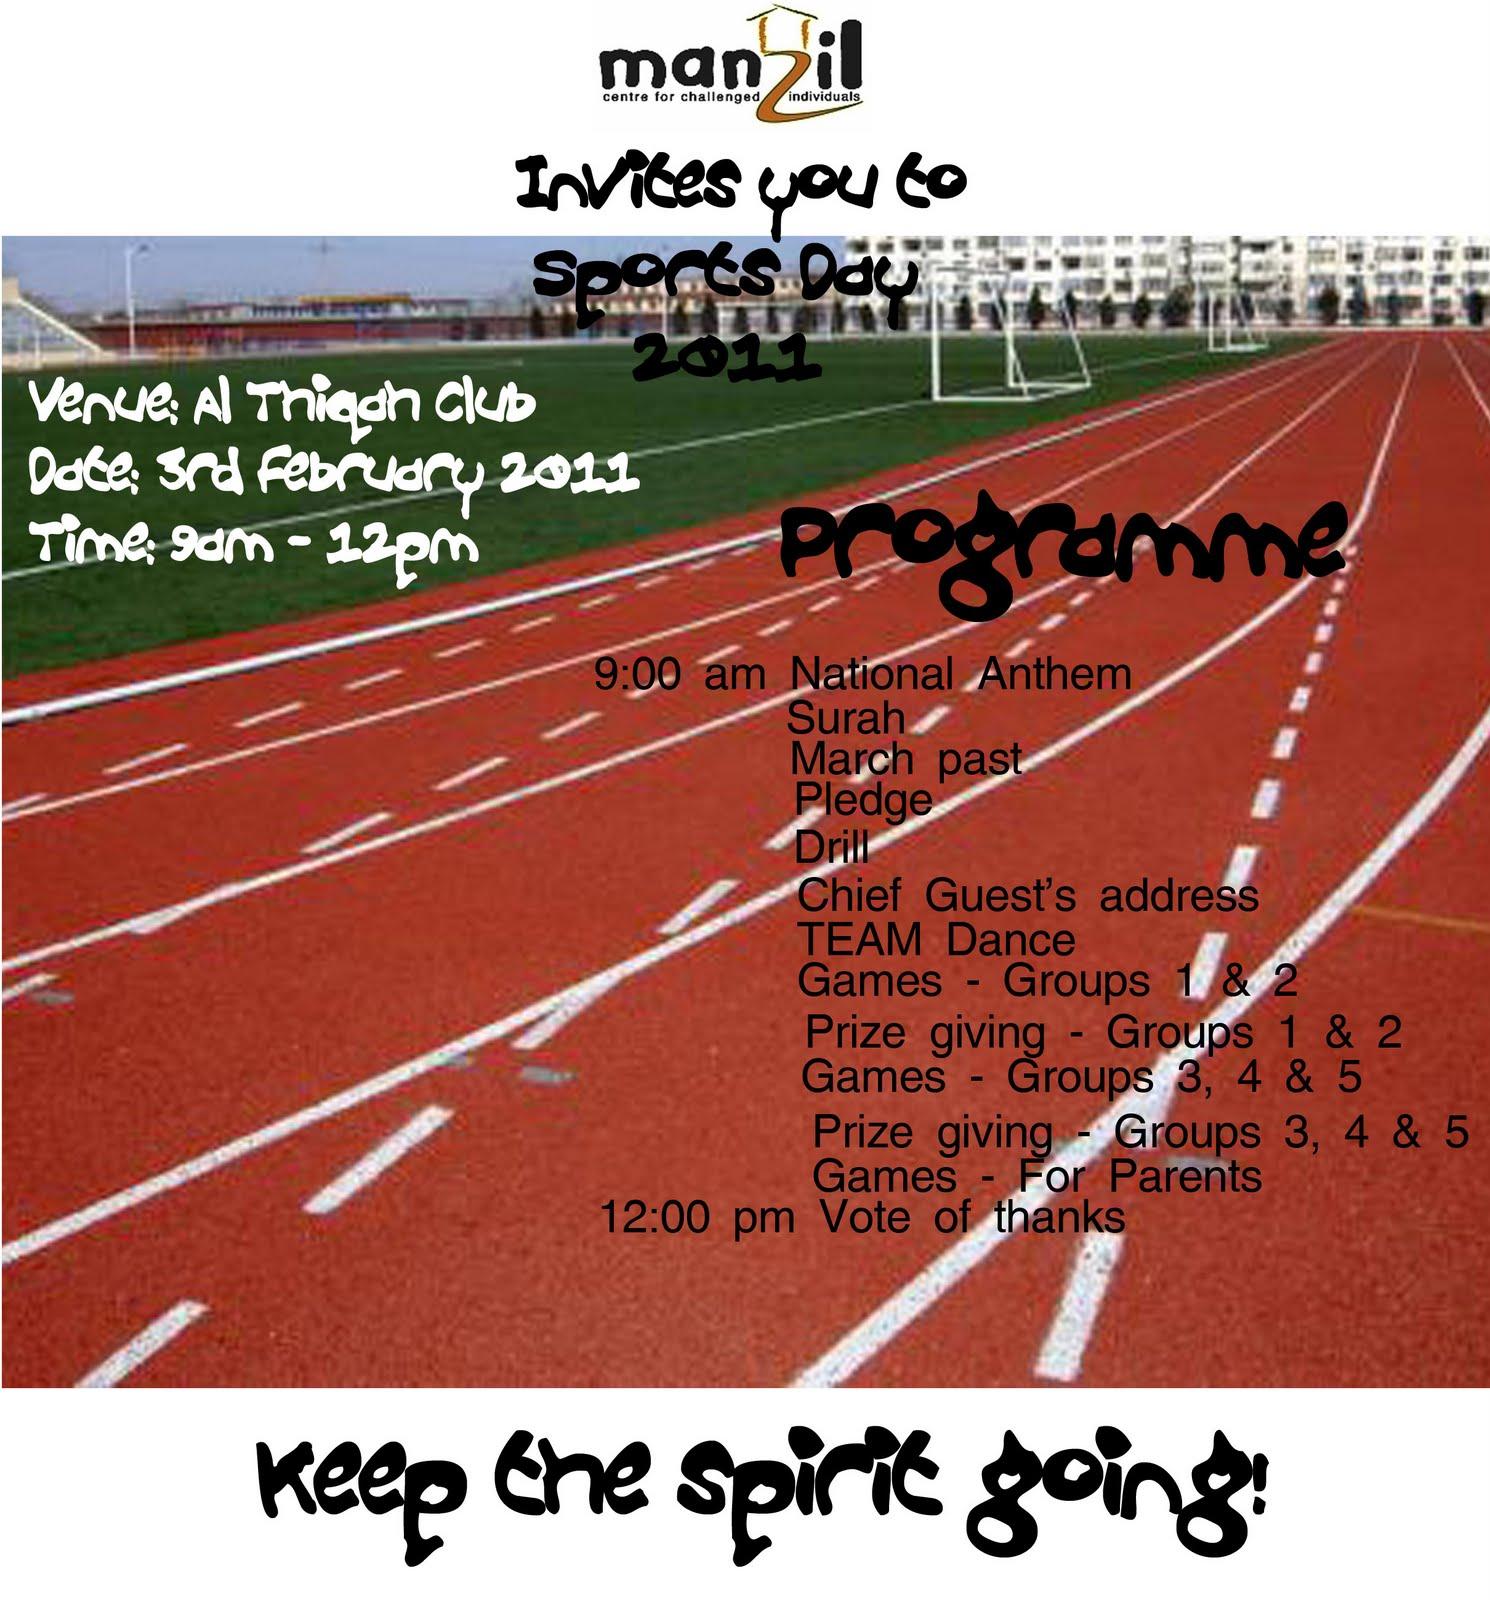 January 2011 clicksandwrites manzil sports day invitation 3rd february 2011 stopboris Choice Image